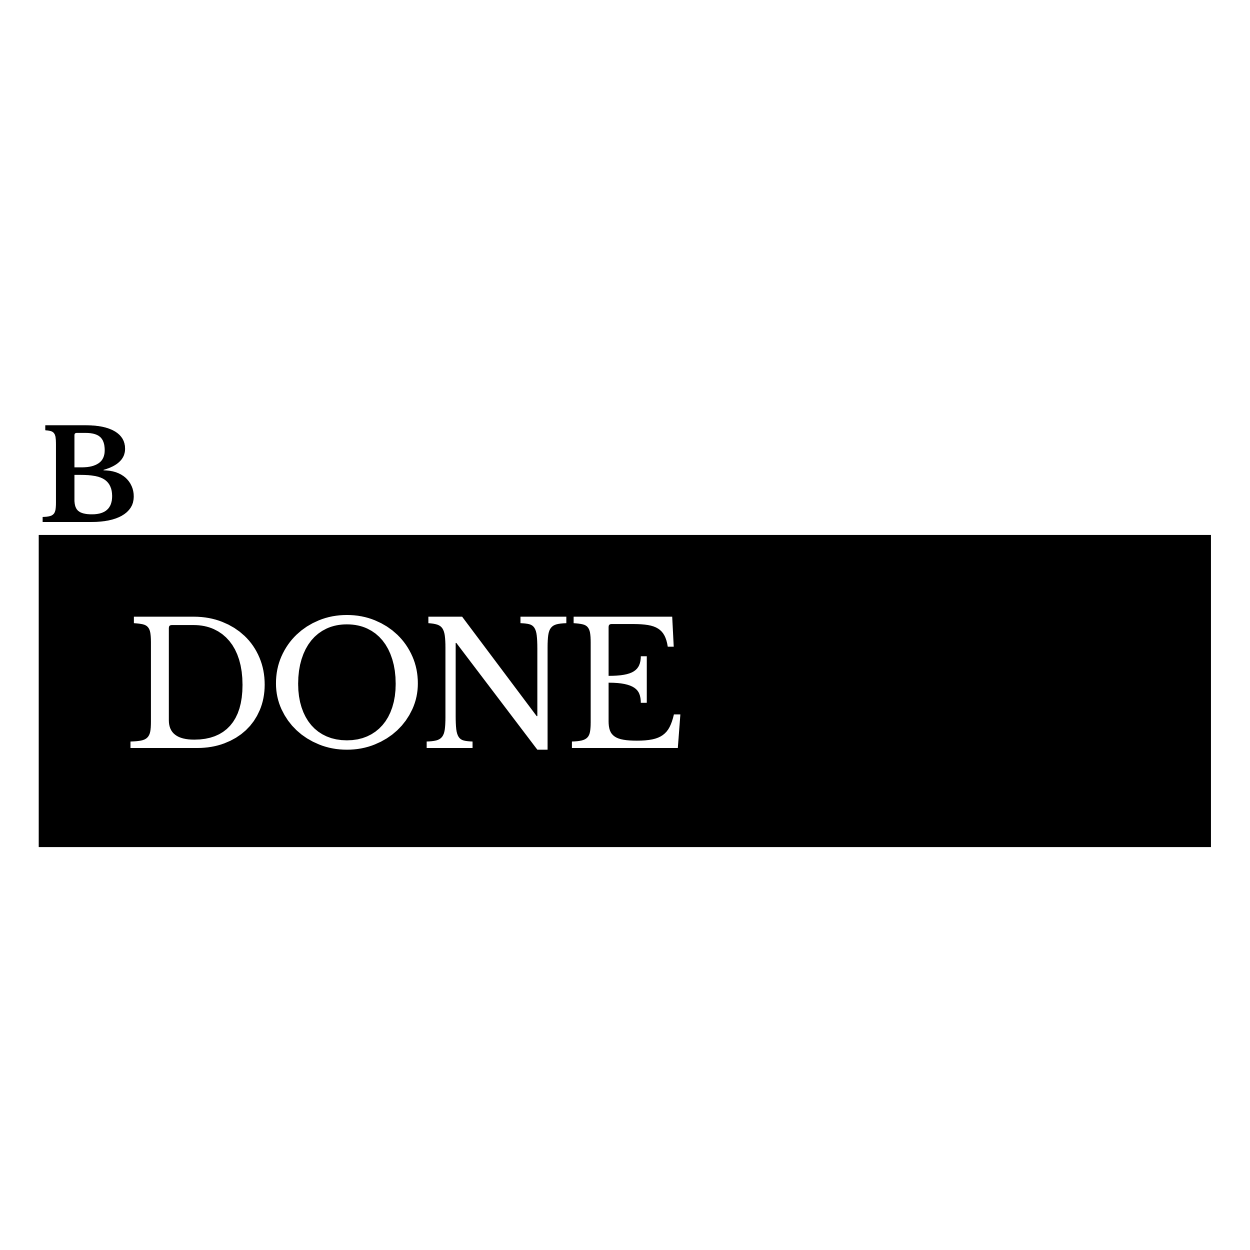 B.done